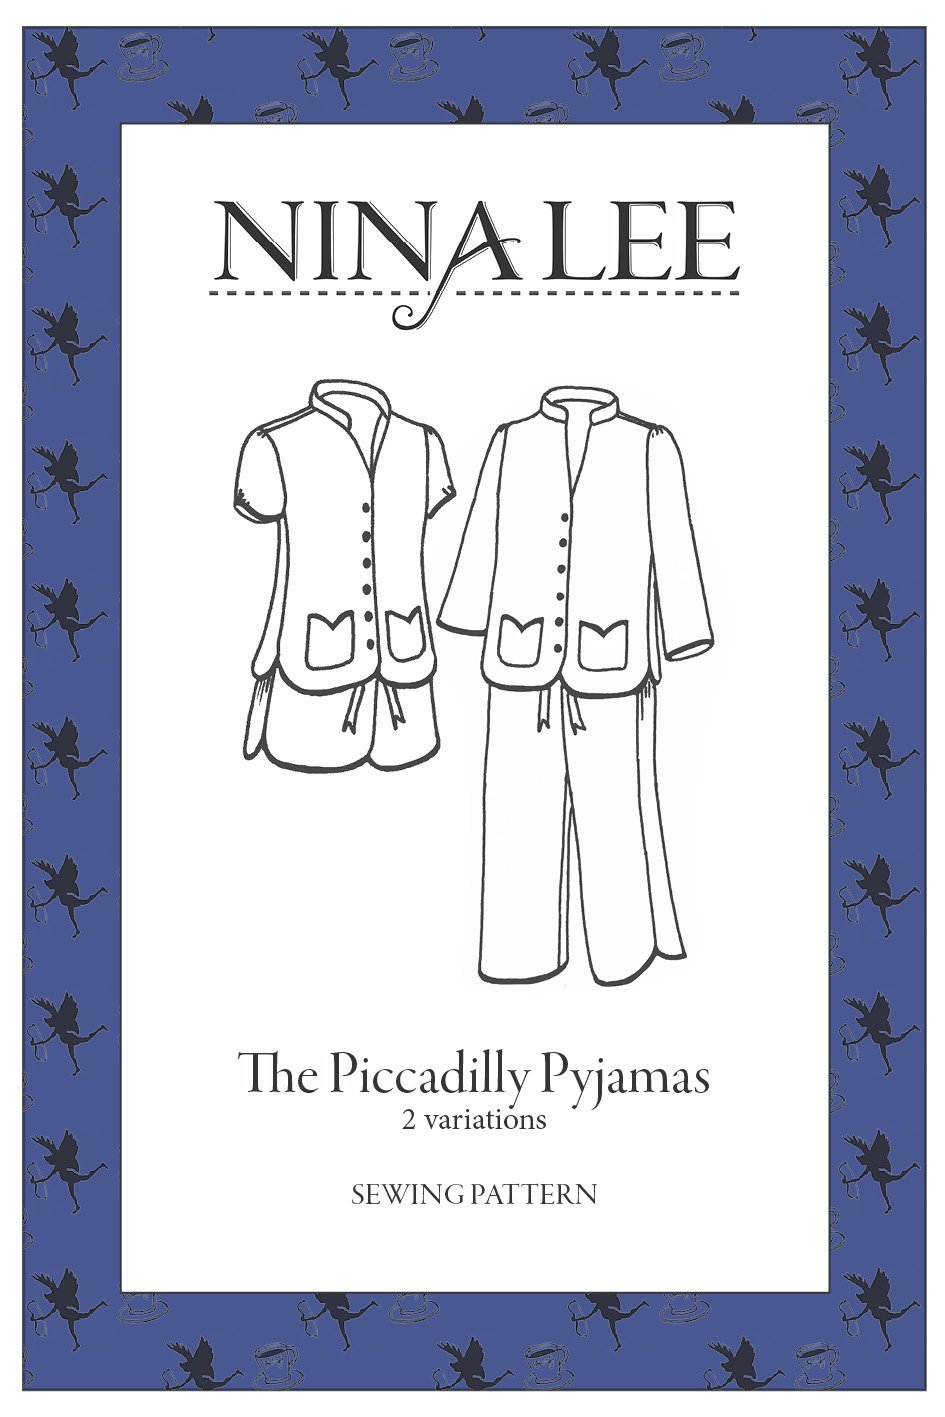 Piccadilly Pajamas - Nina Lee